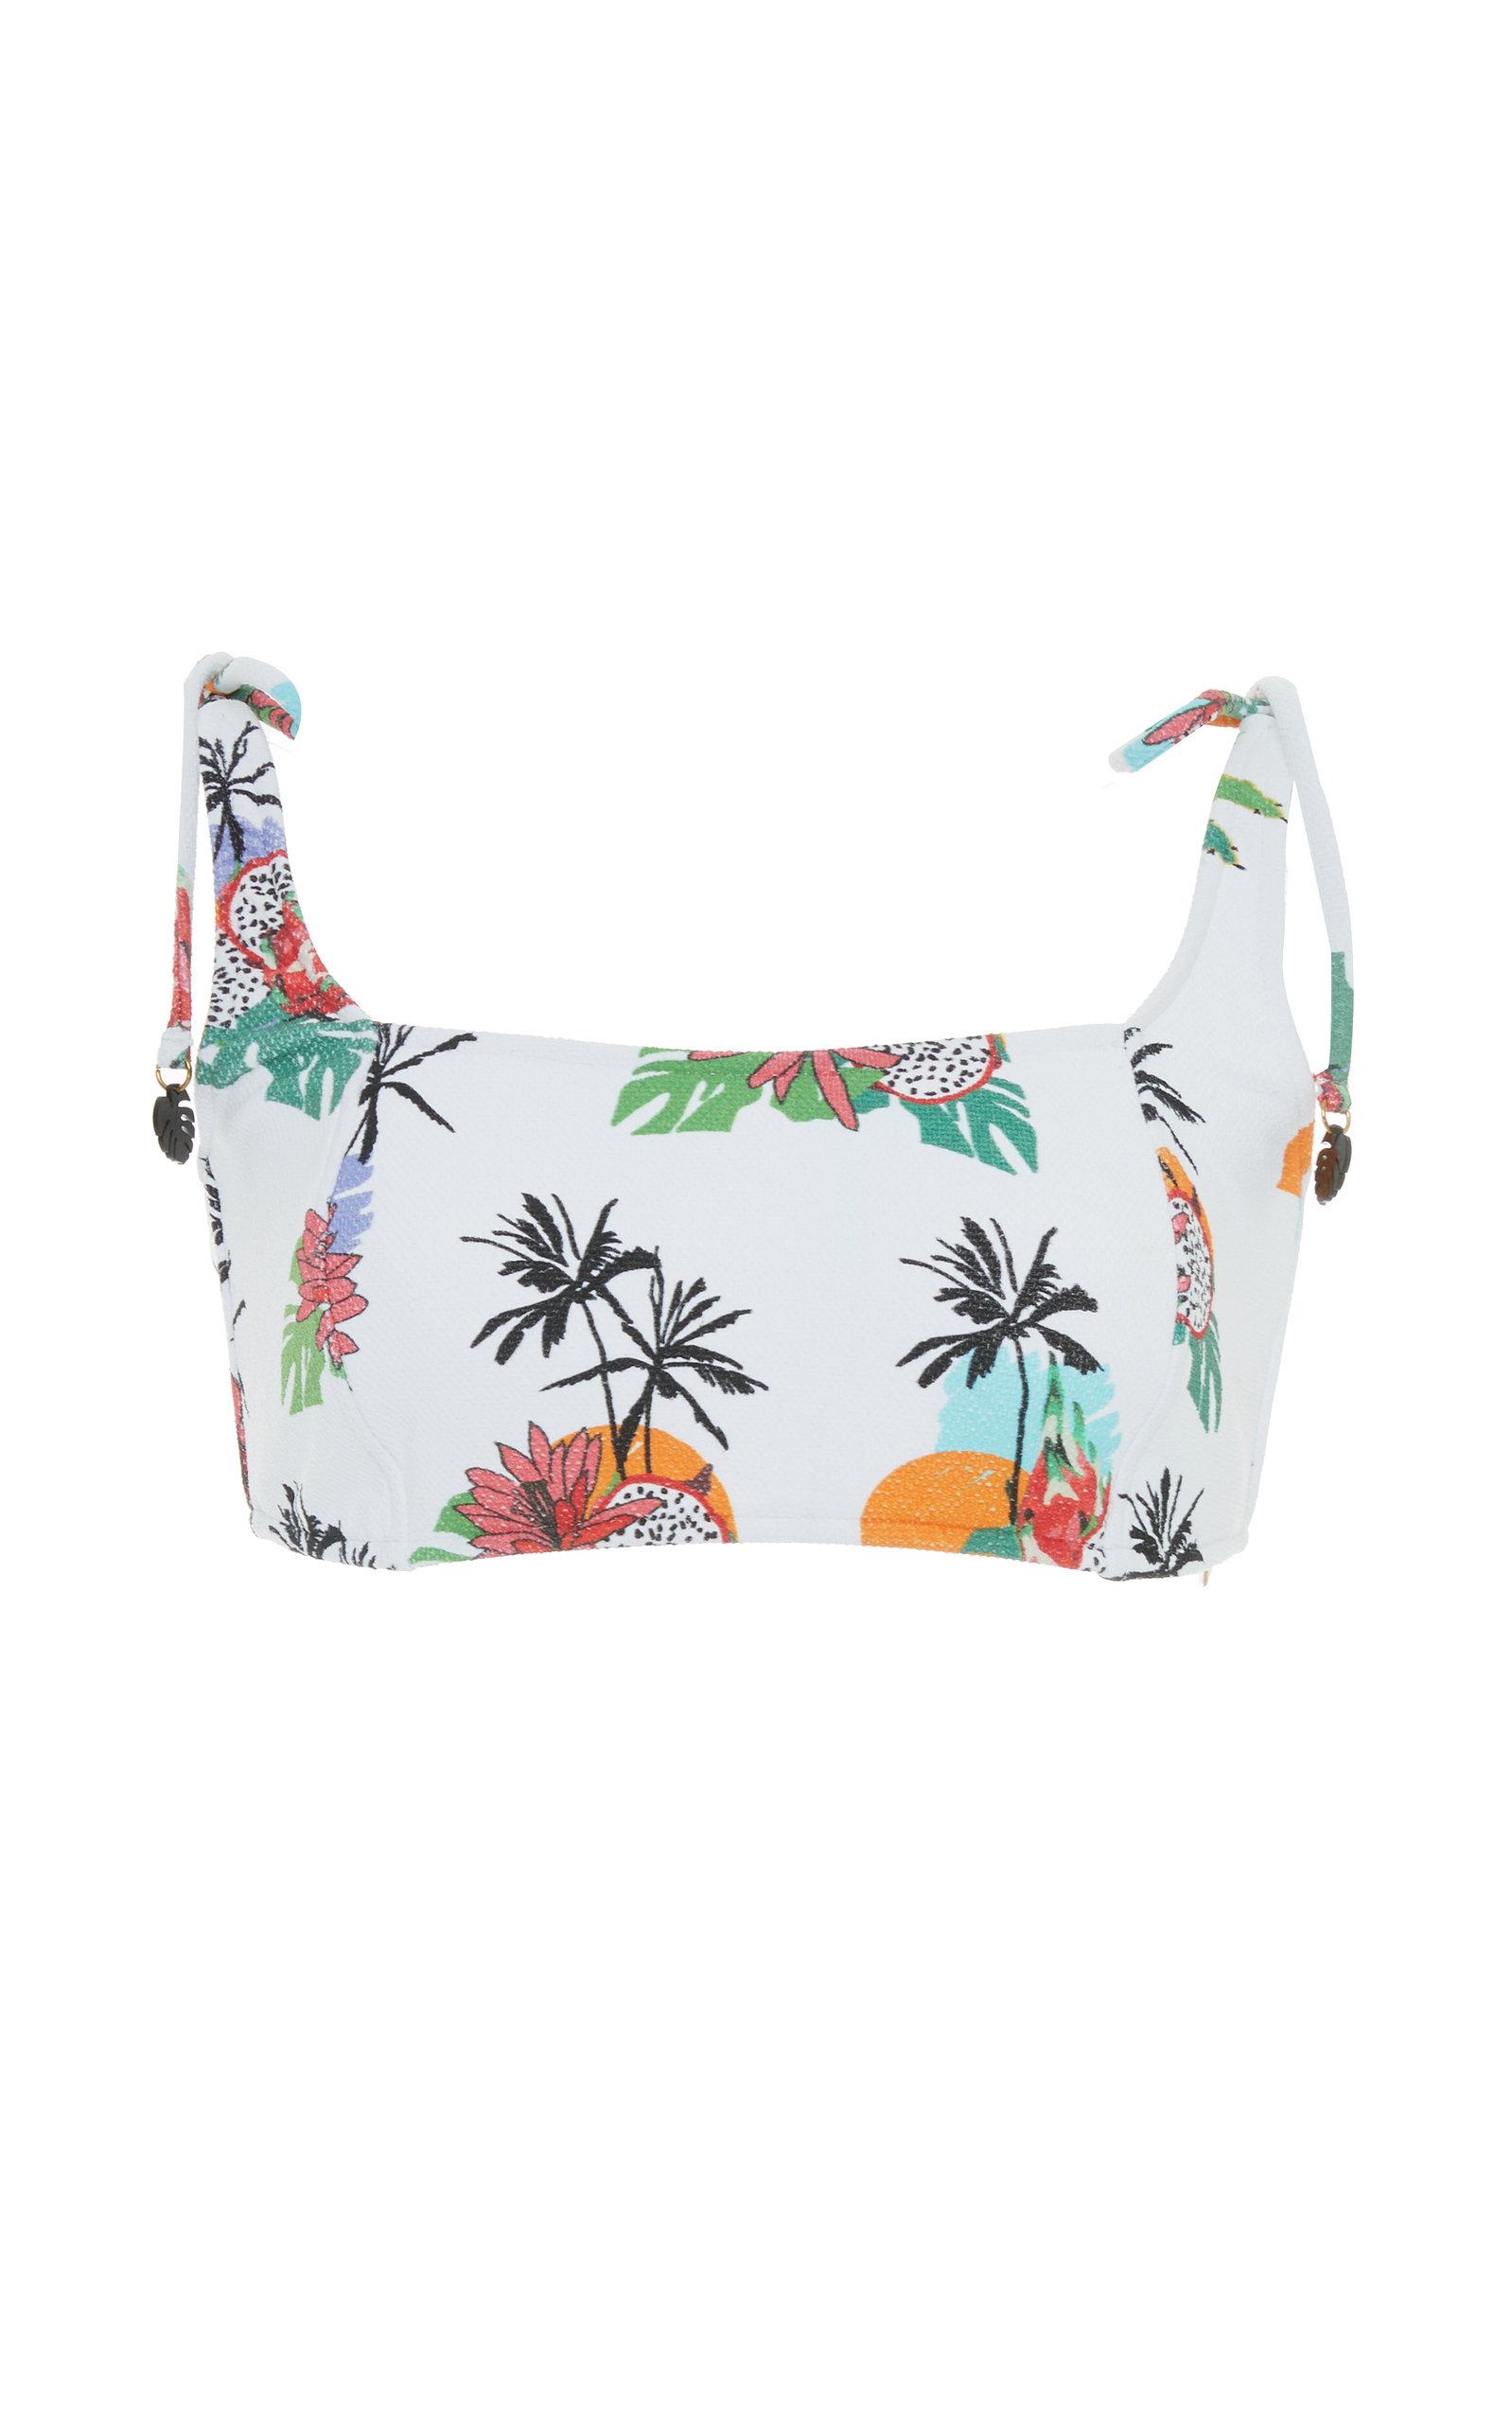 SALINAS Palms Printed Bikini Top in White